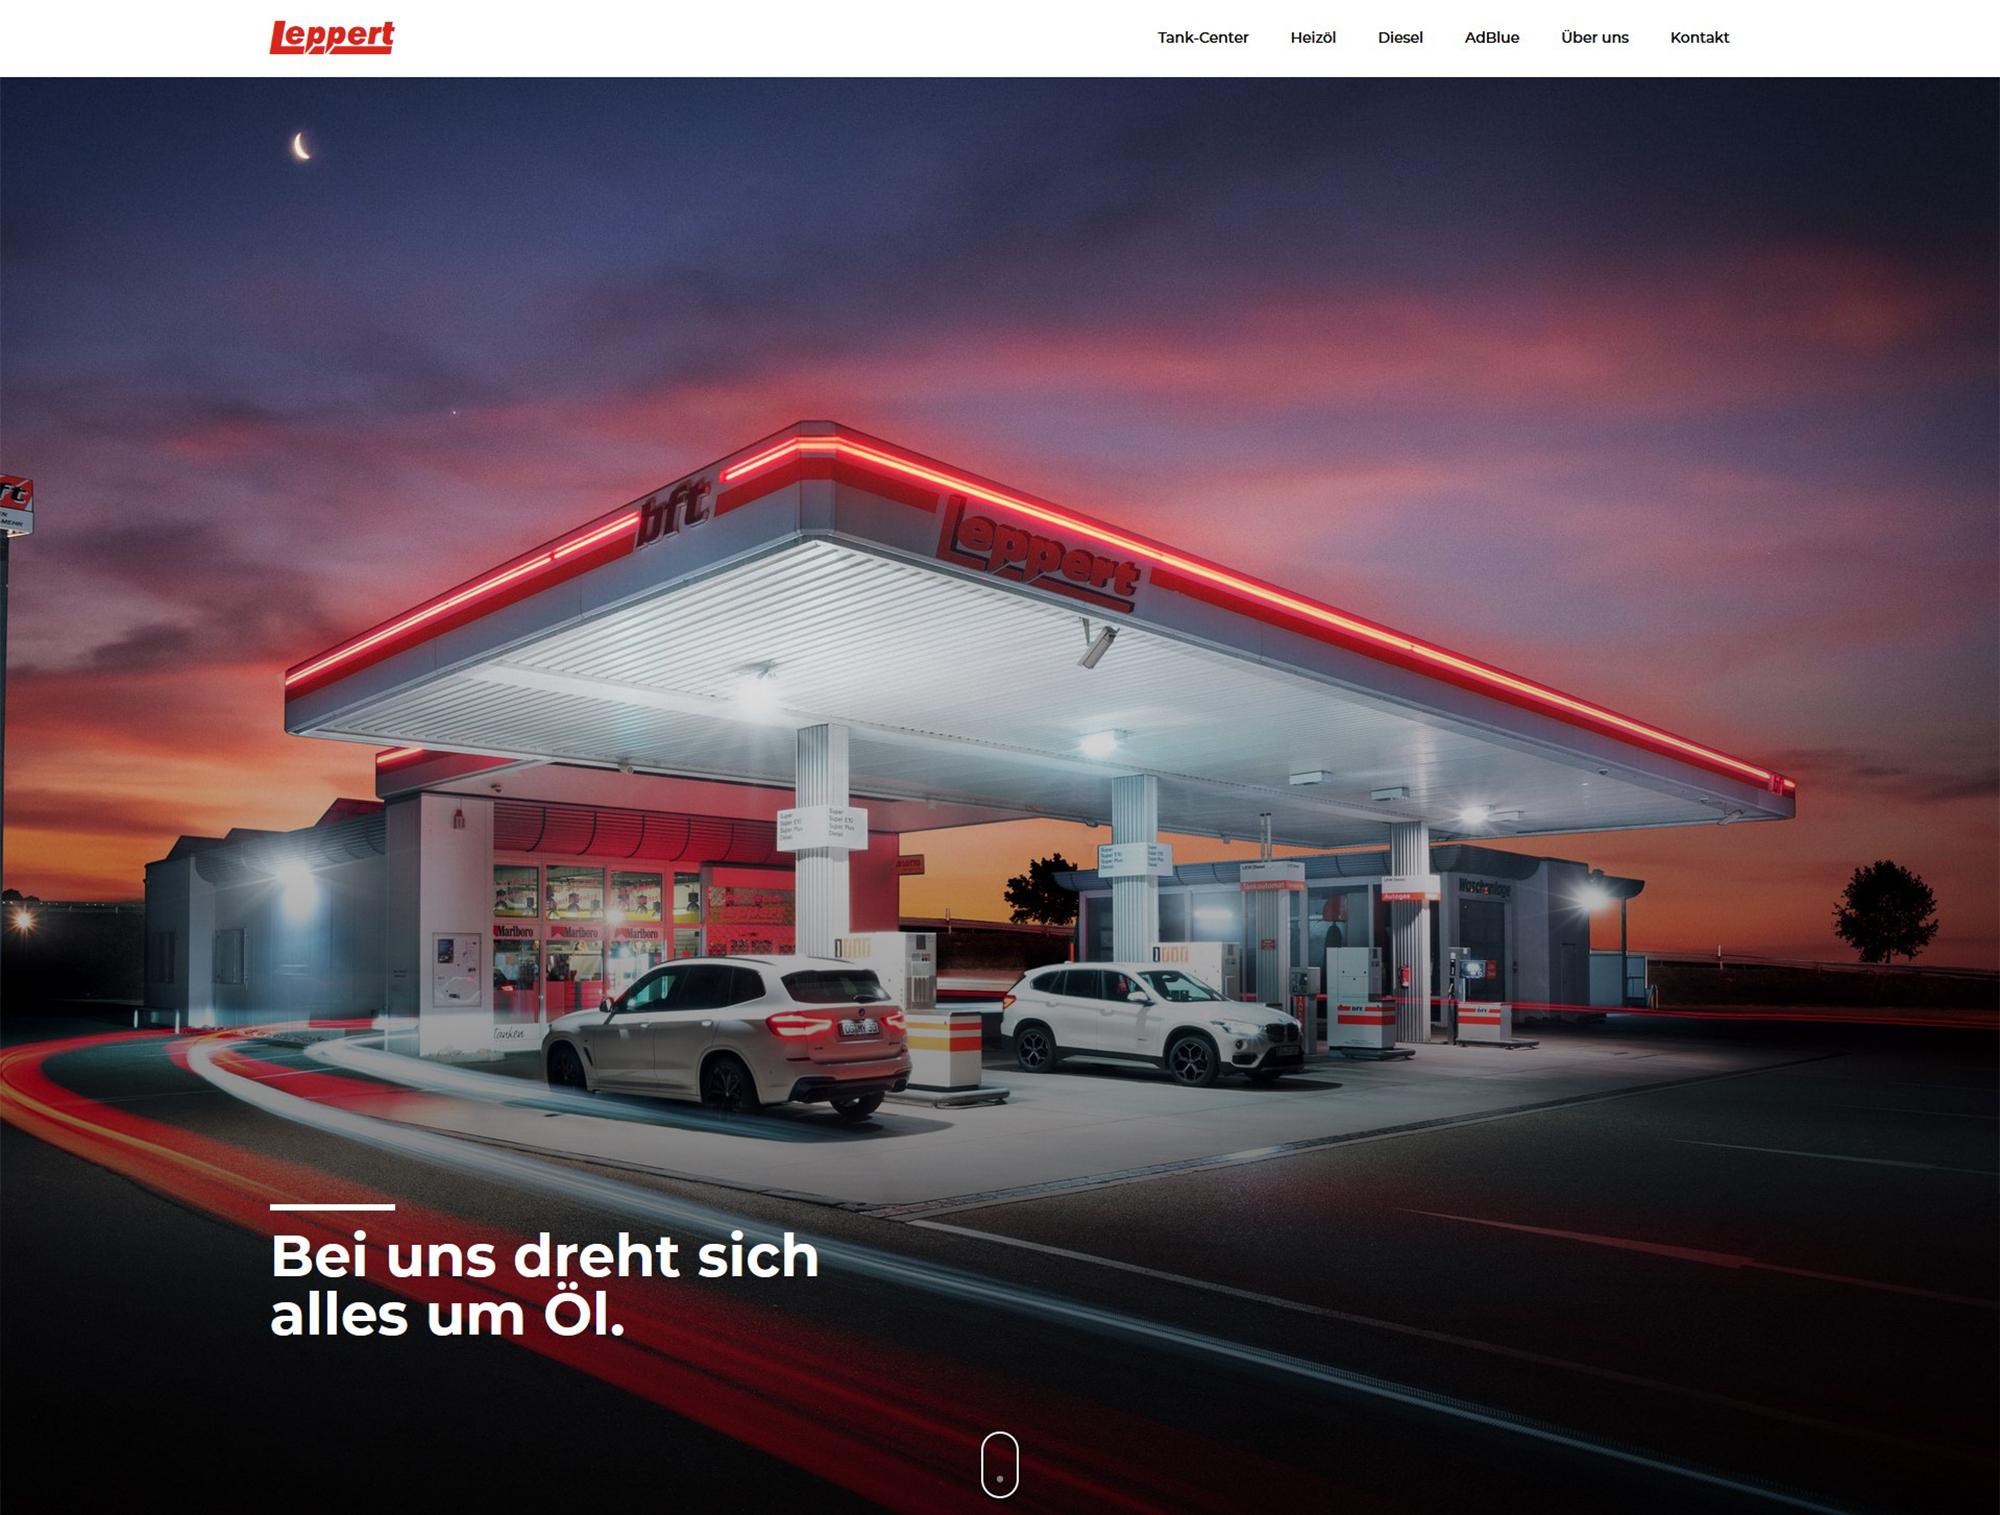 kopfmedia werbeagentur leppert mineraloele website homepage